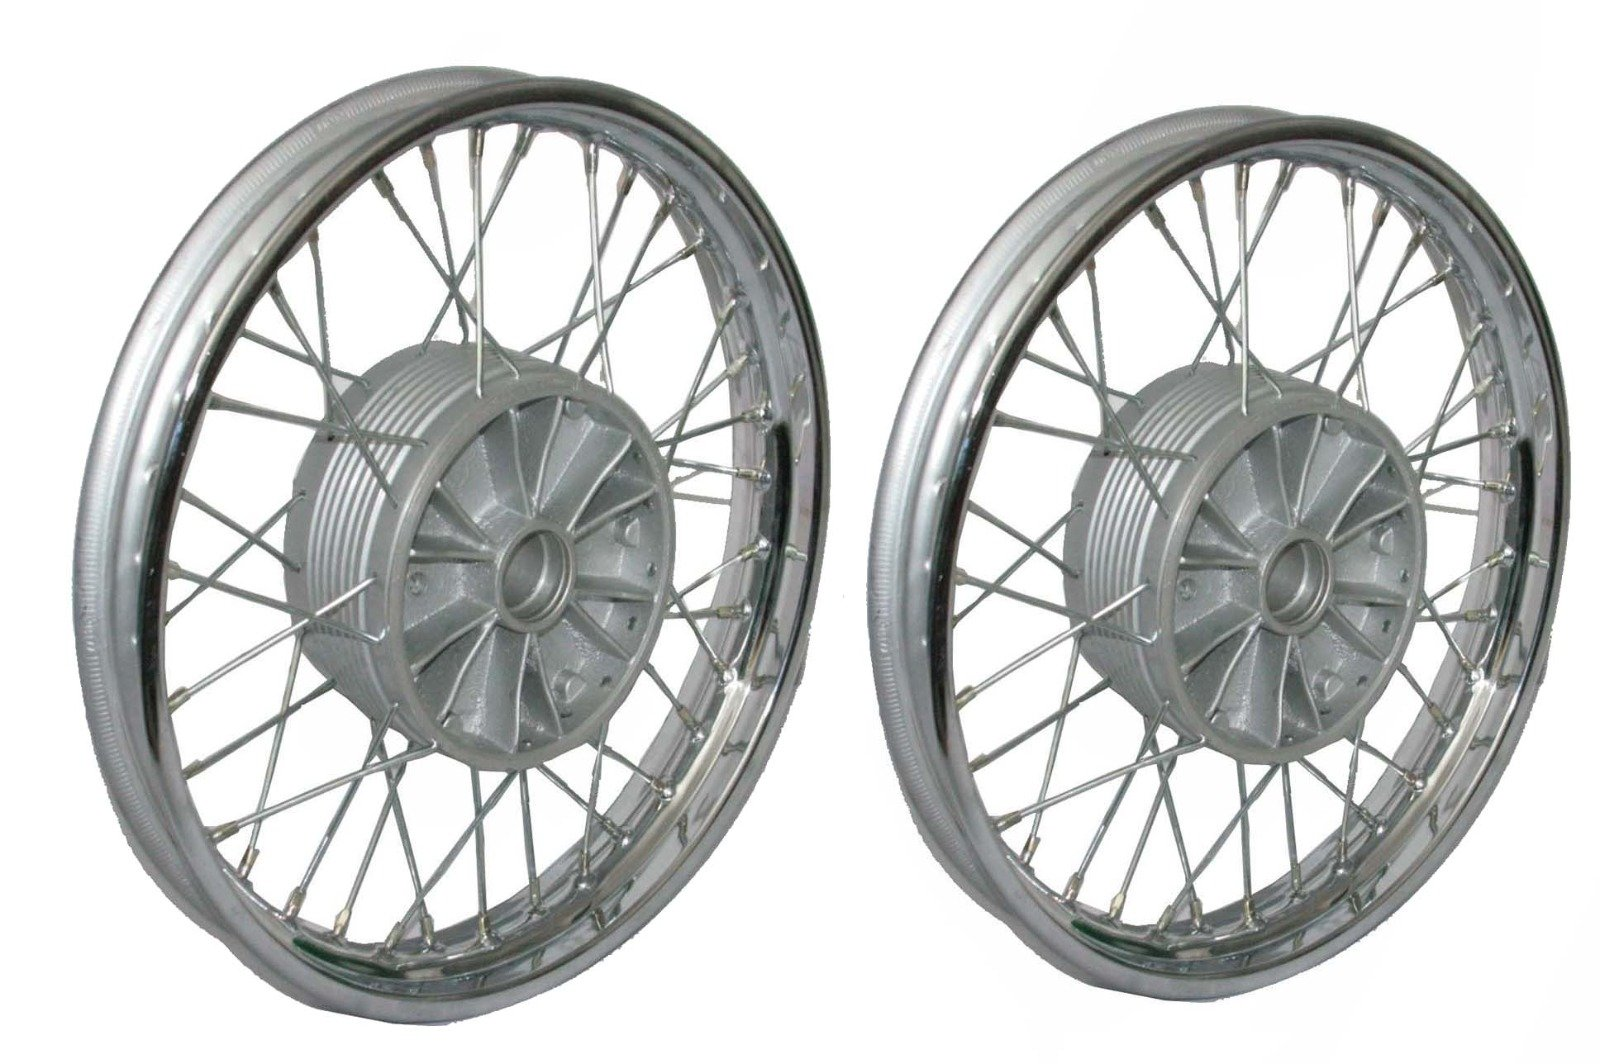 Enfield County Pair Chrome Plate Front Rear 16'' Wm2 Jawa 250 350 Cw 36 Holes Wheel Rim + Spokes